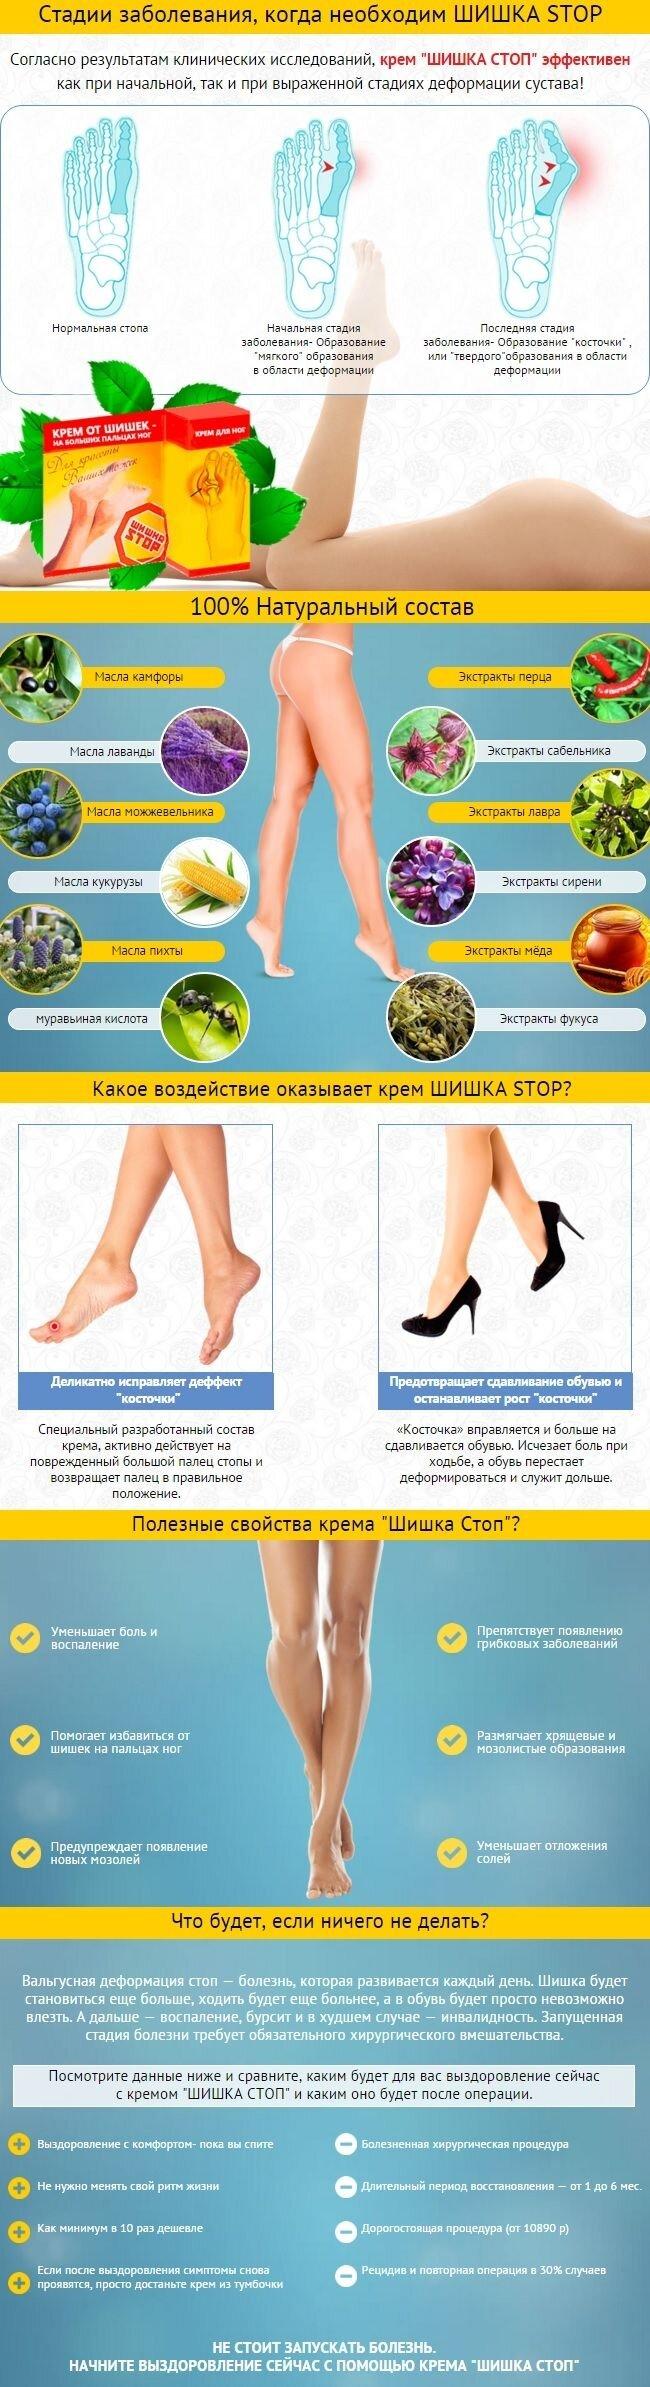 Крем «ШИШКА СТОП» от шишек на больших пальцах ног - фото купить крем шишка стоп